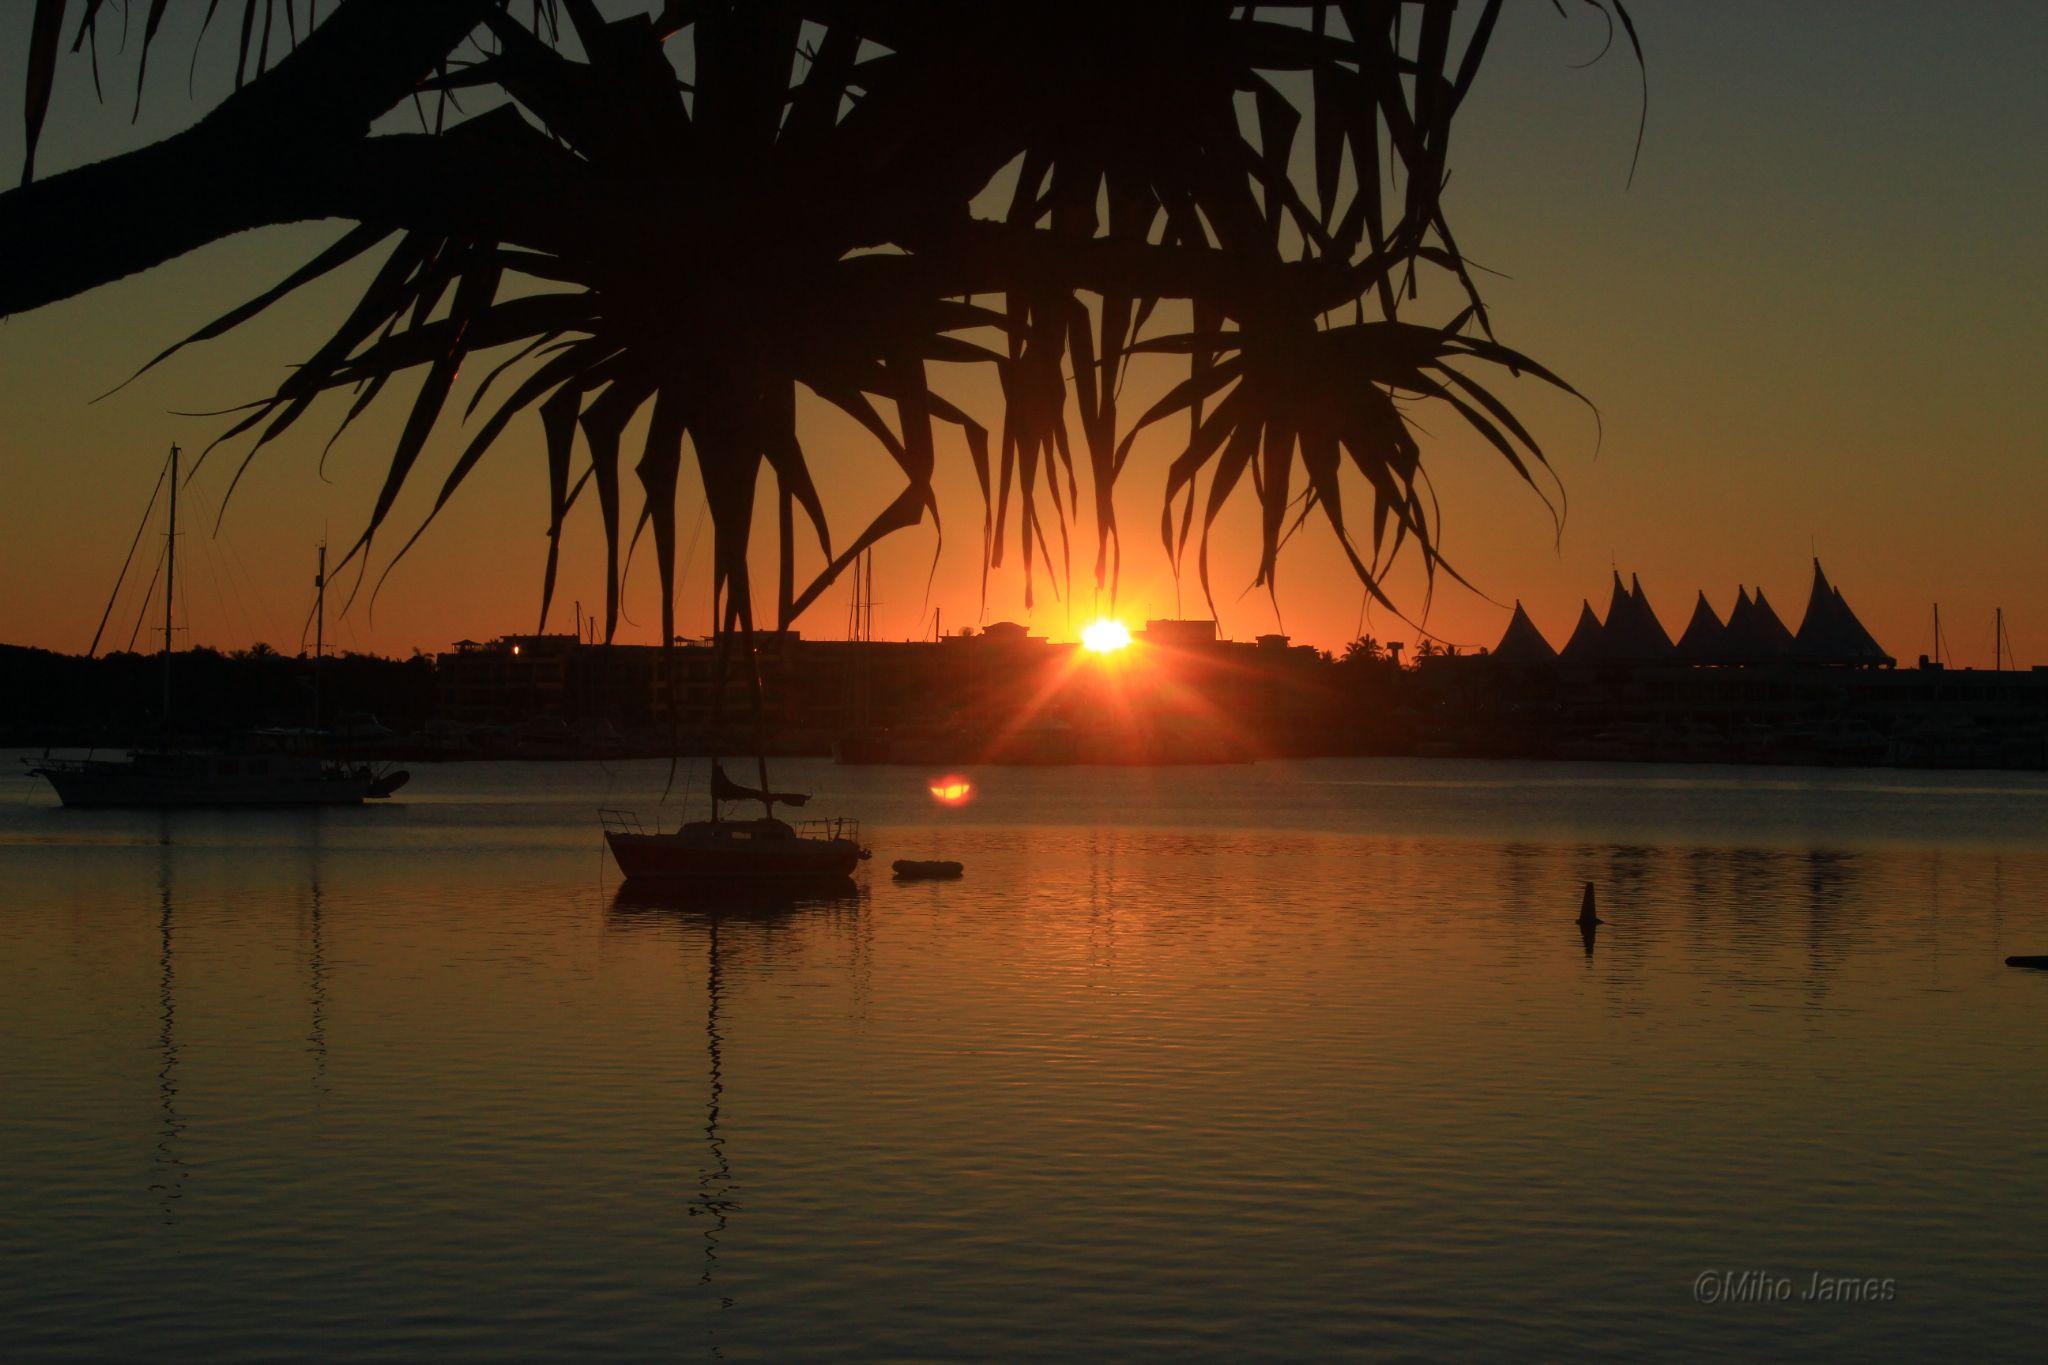 Sunrise in Broadwater, Gold Coast, Australia by miho.james